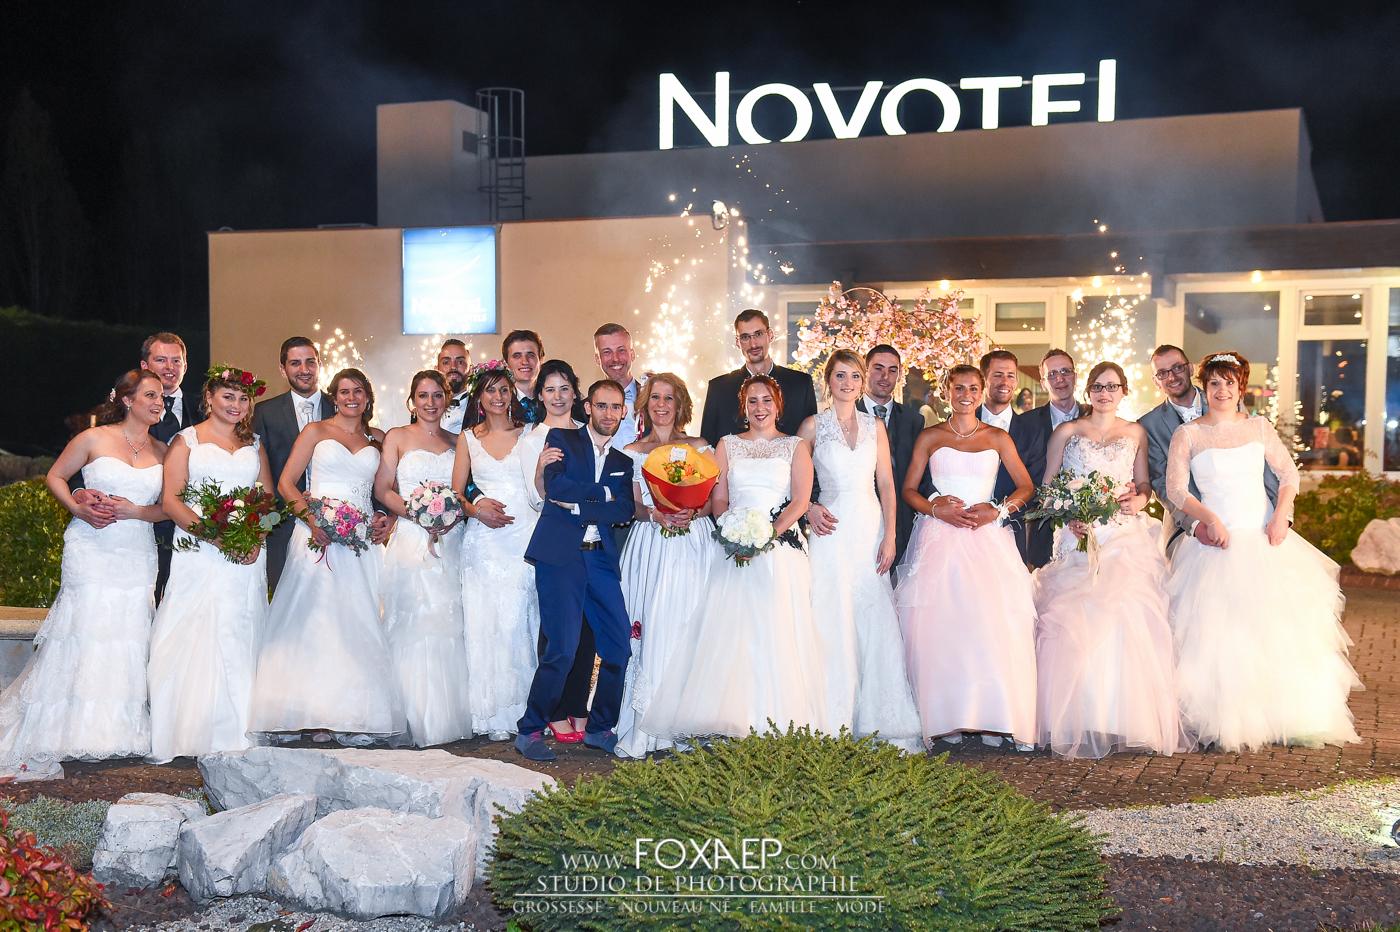 foxaep-photographe-mariage-dijon-annecy-lt-3548